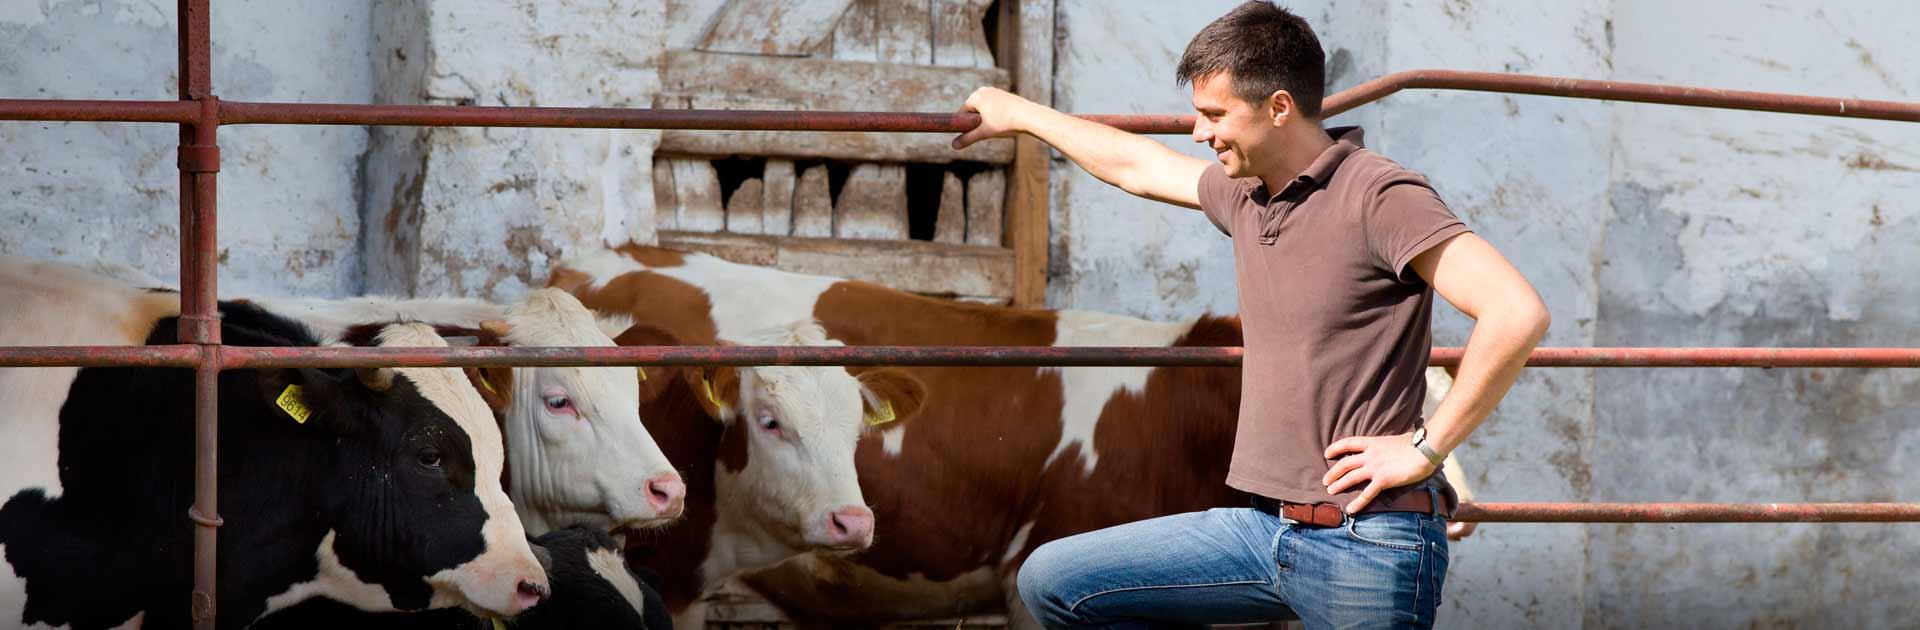 dayfarm Agrotrainee - Ukrainian agro practicants in Europe